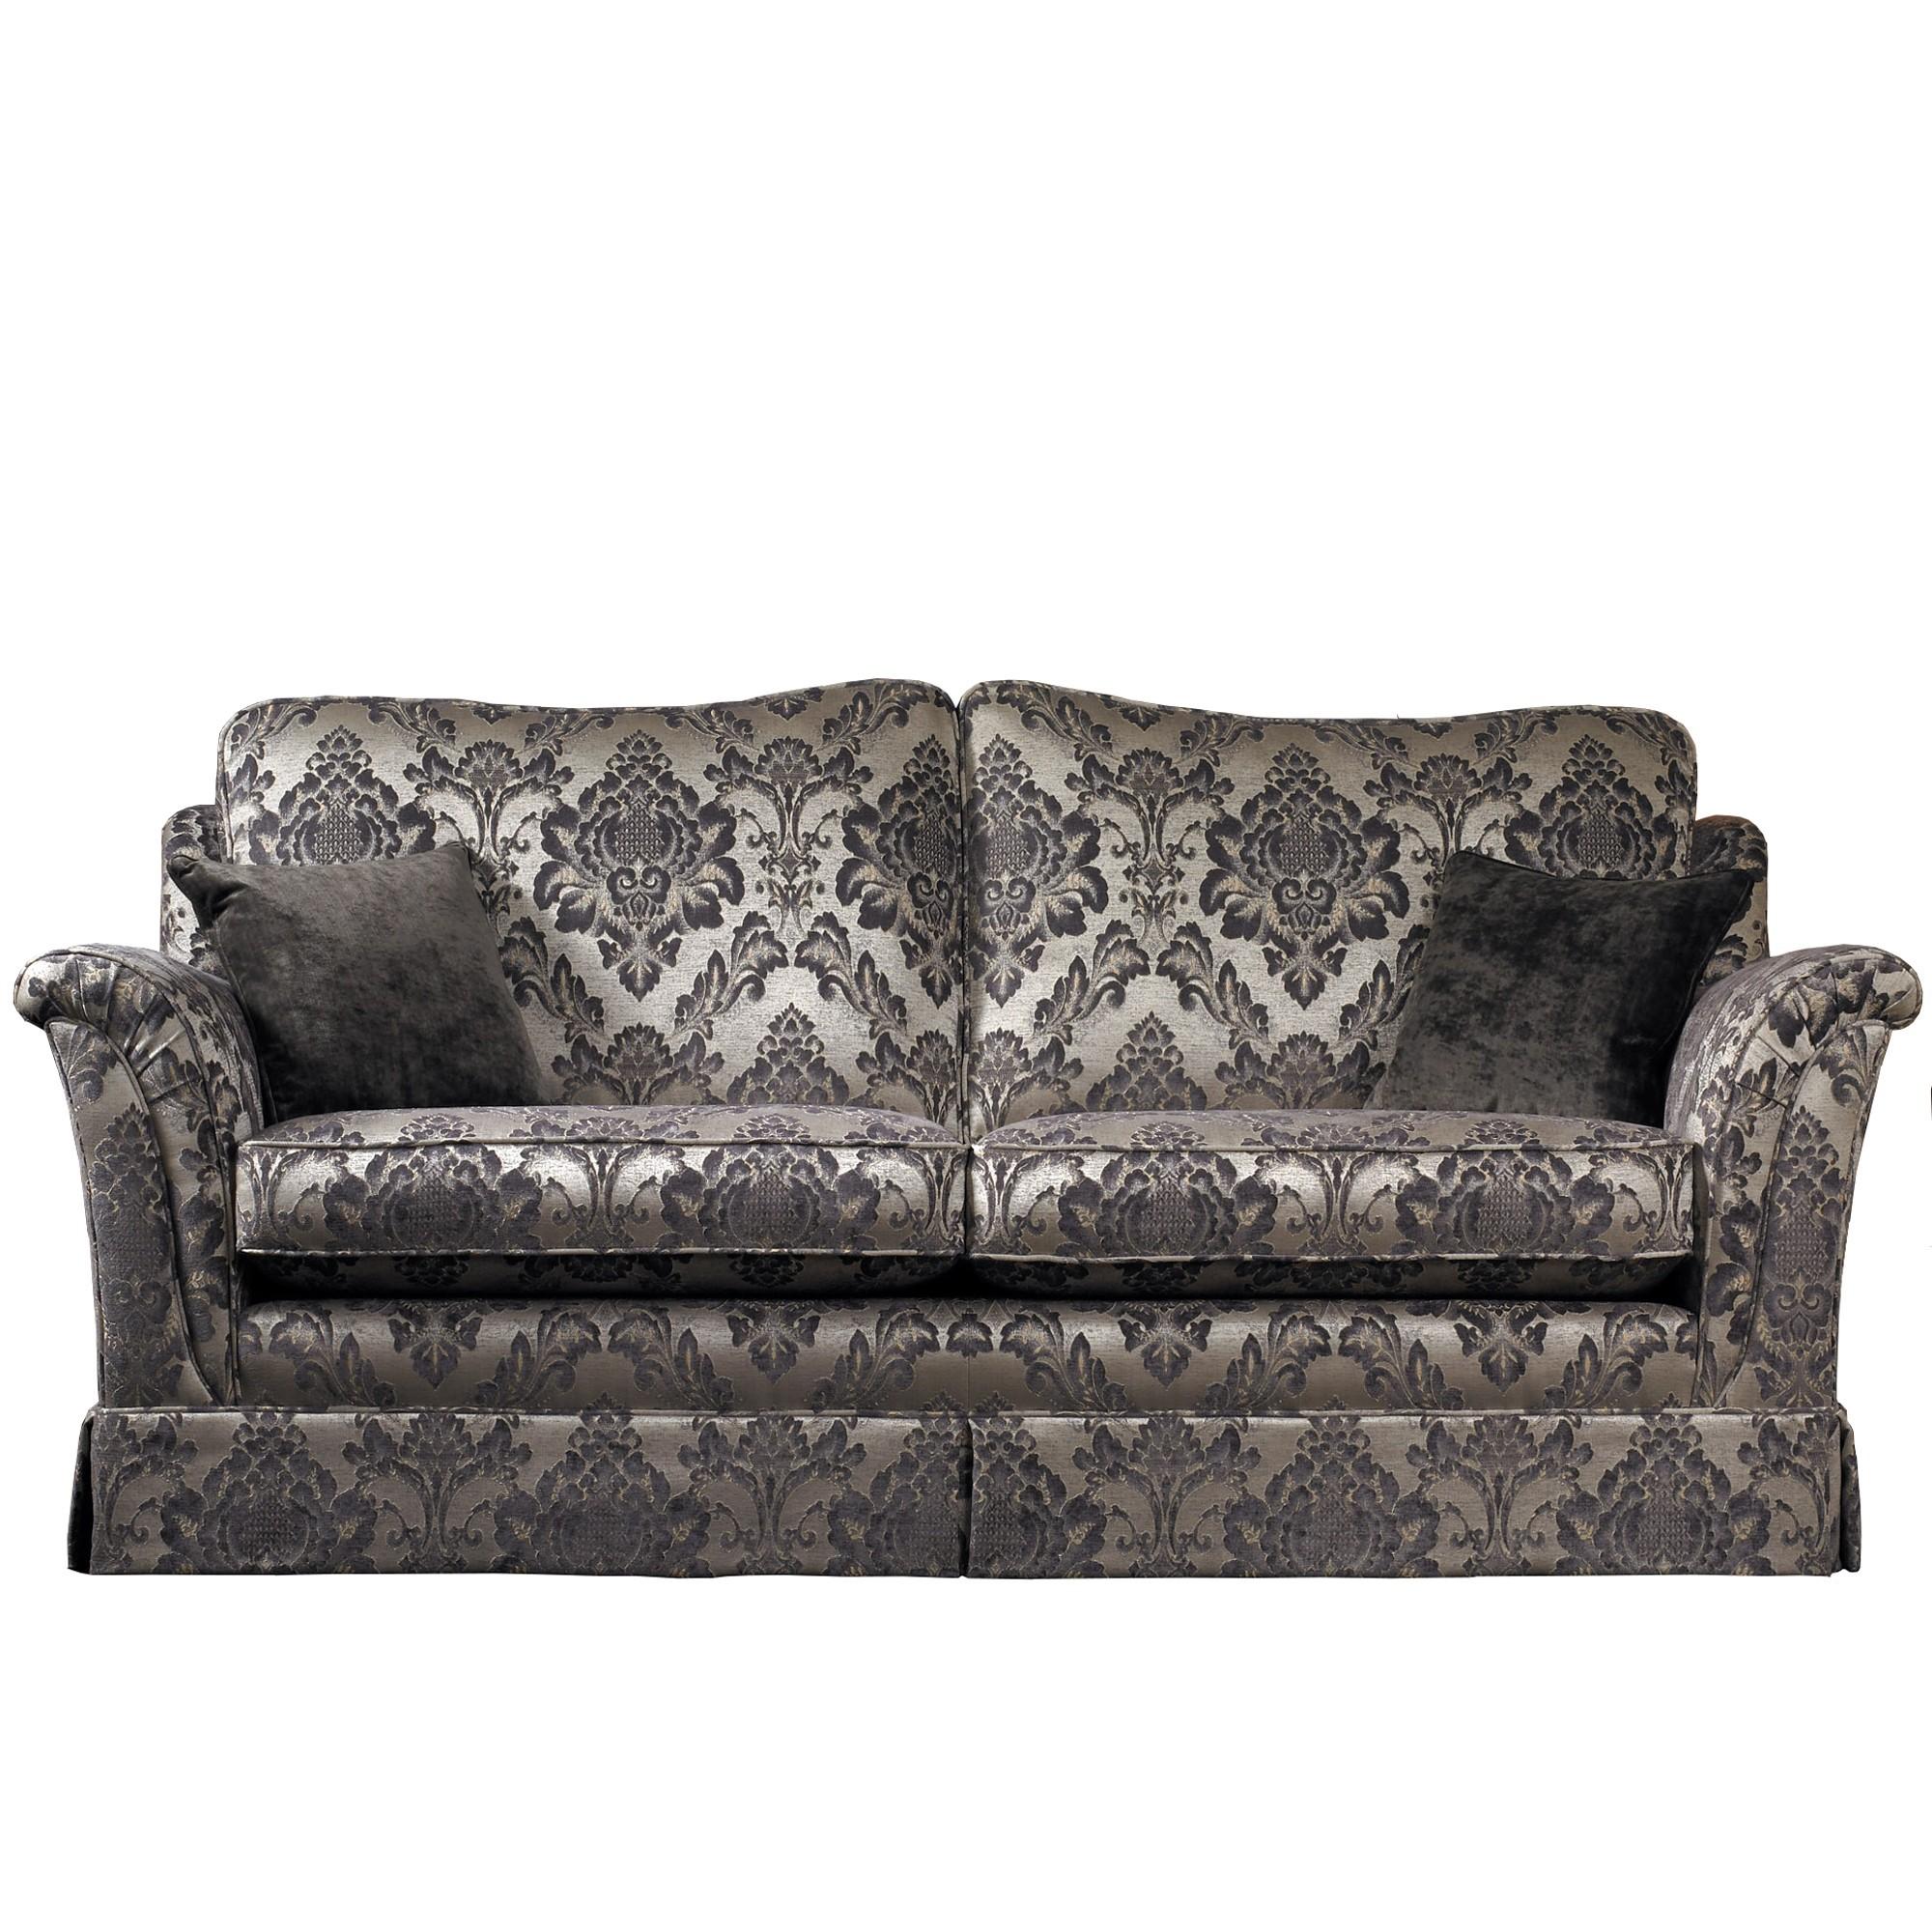 Wade Upholstery Amelia Sofa All Sofas Cookes Furniture